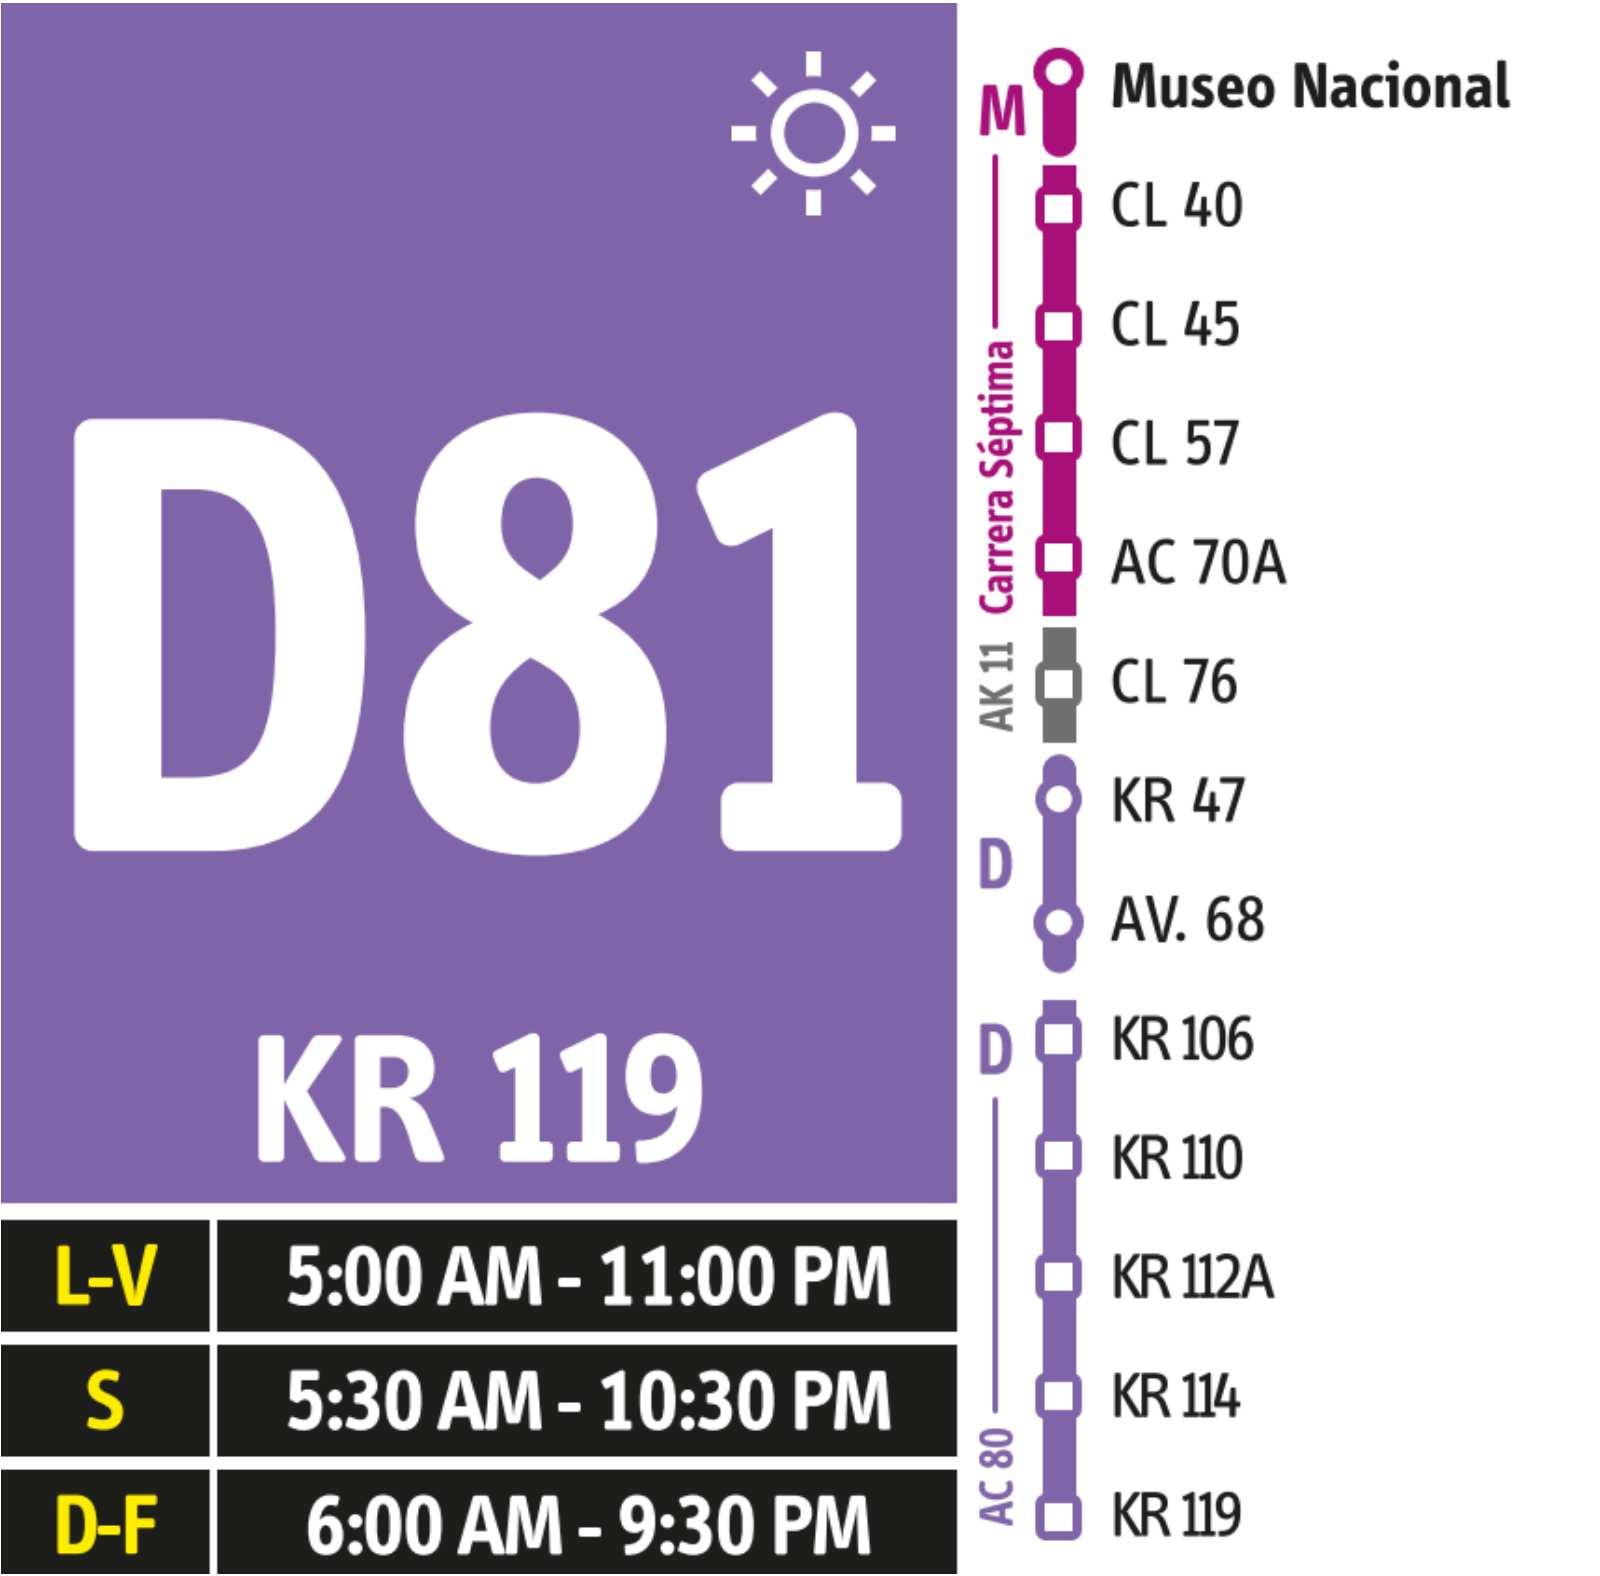 D81-M81 > Museo Nacional - Calle 80 Puente de Guadua